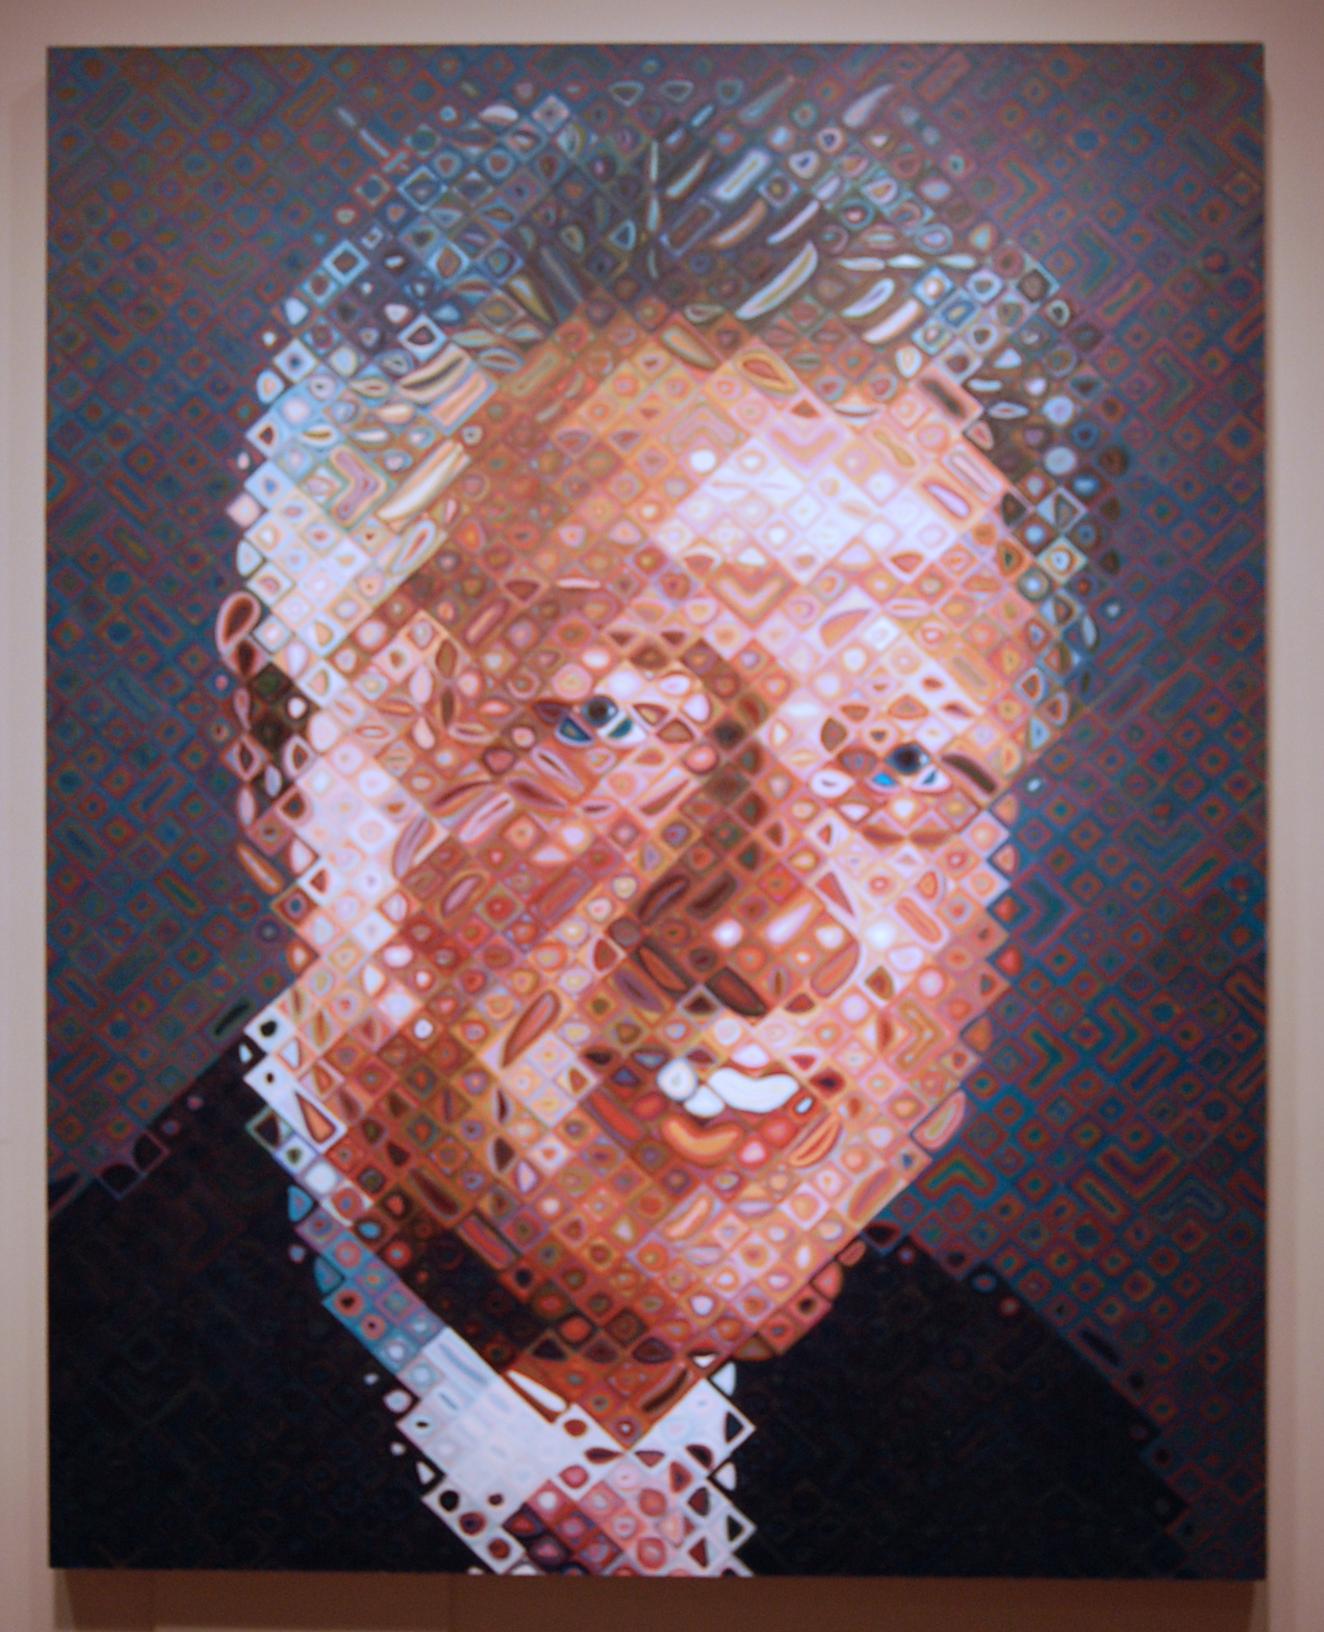 Chuck Close Bill Clinton Thinkvisual S Blog